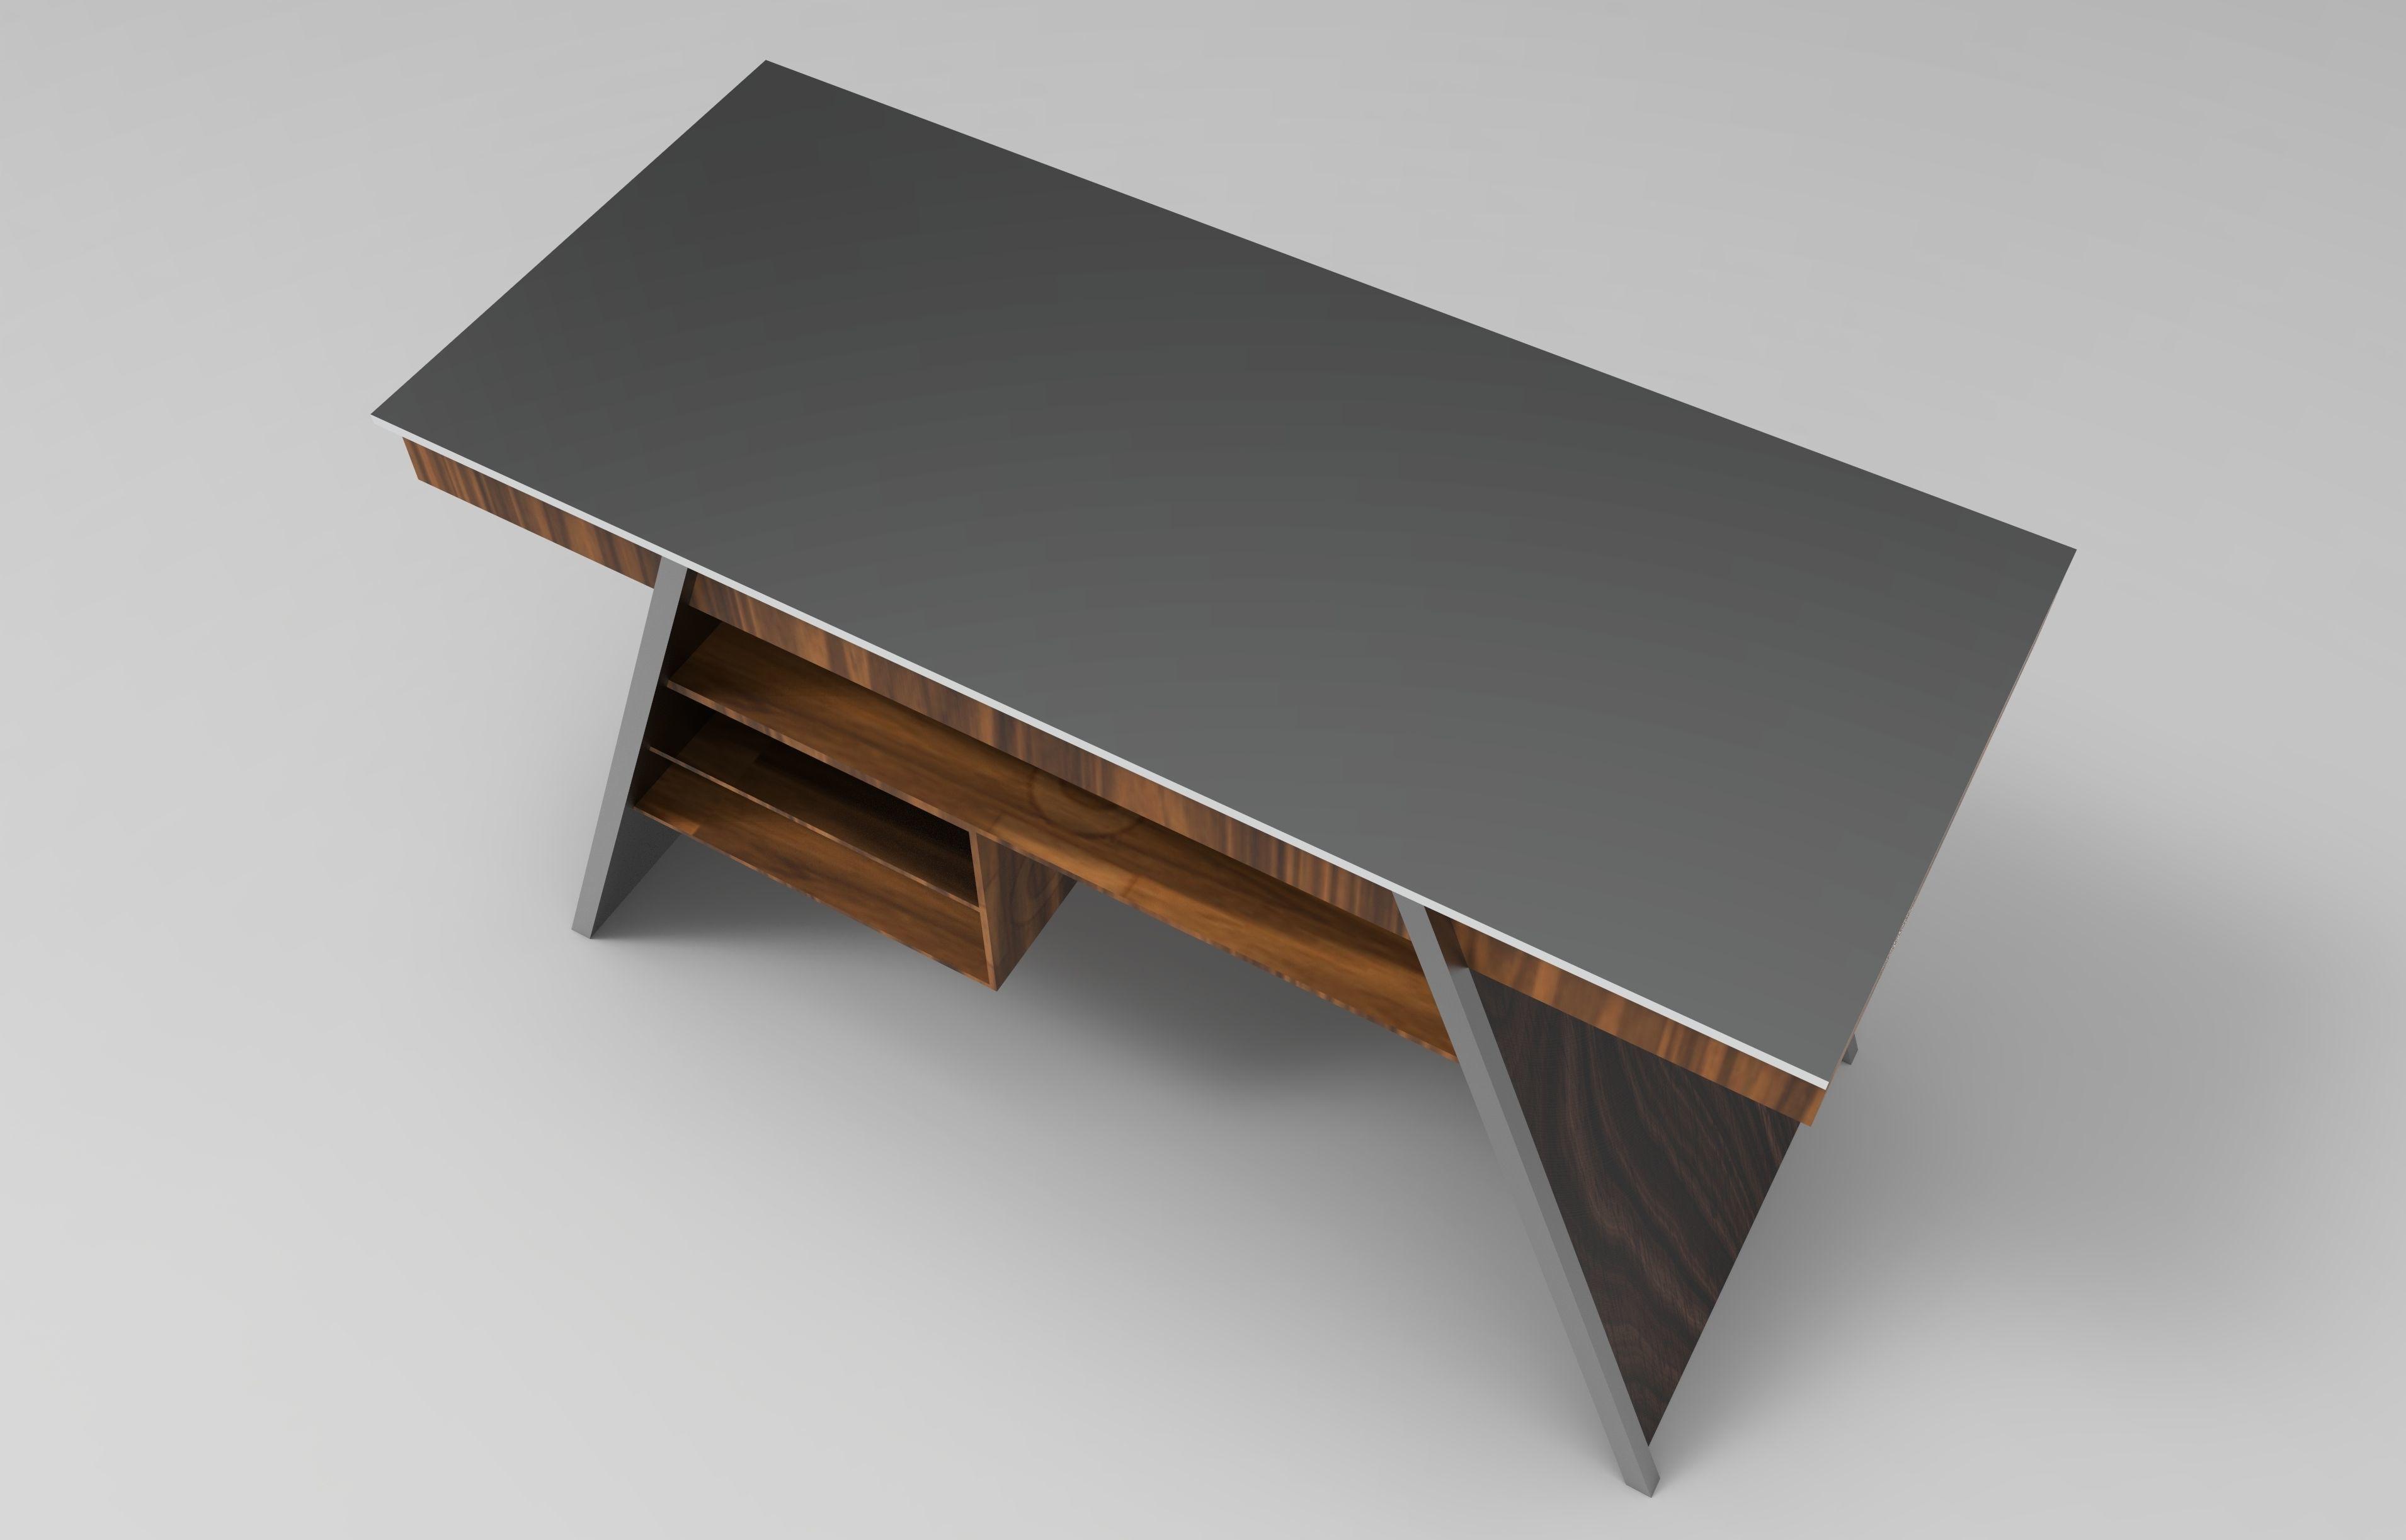 ... designer work desk 3d model iam ipt 3 ... & bench 3D model Designer Work Desk   CGTrader